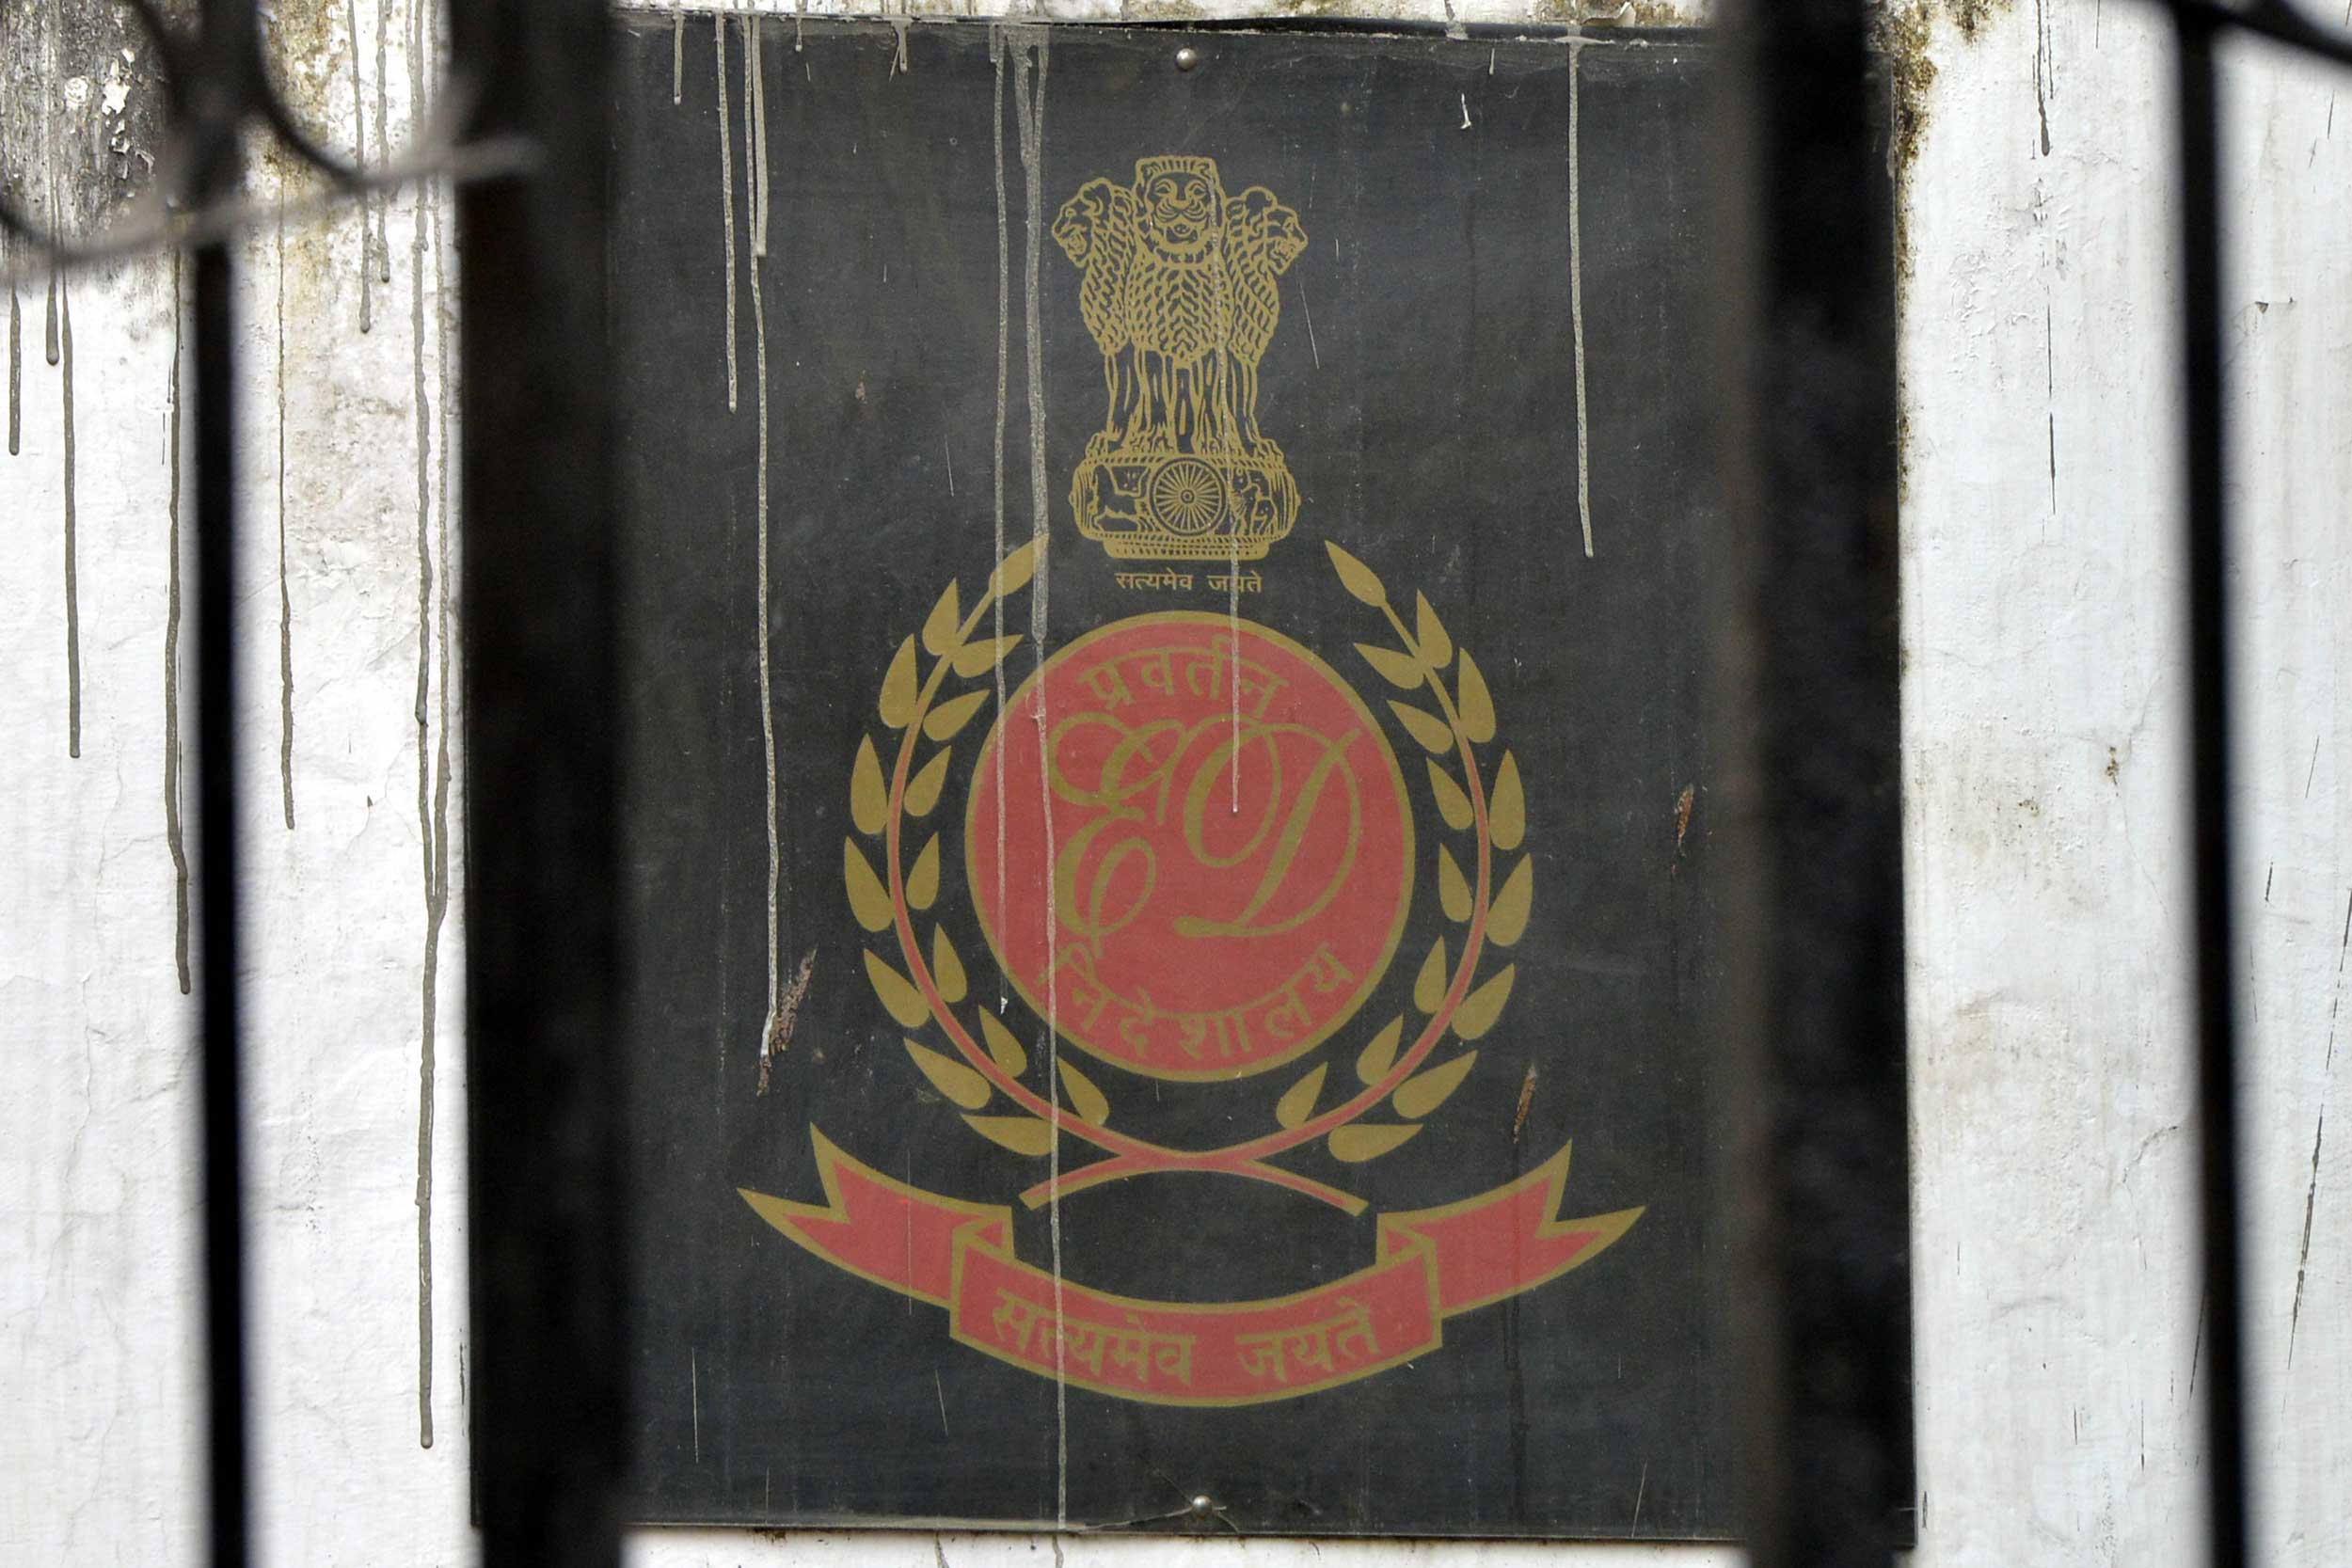 The Enforcement Directorate headquarters in New Delhi.